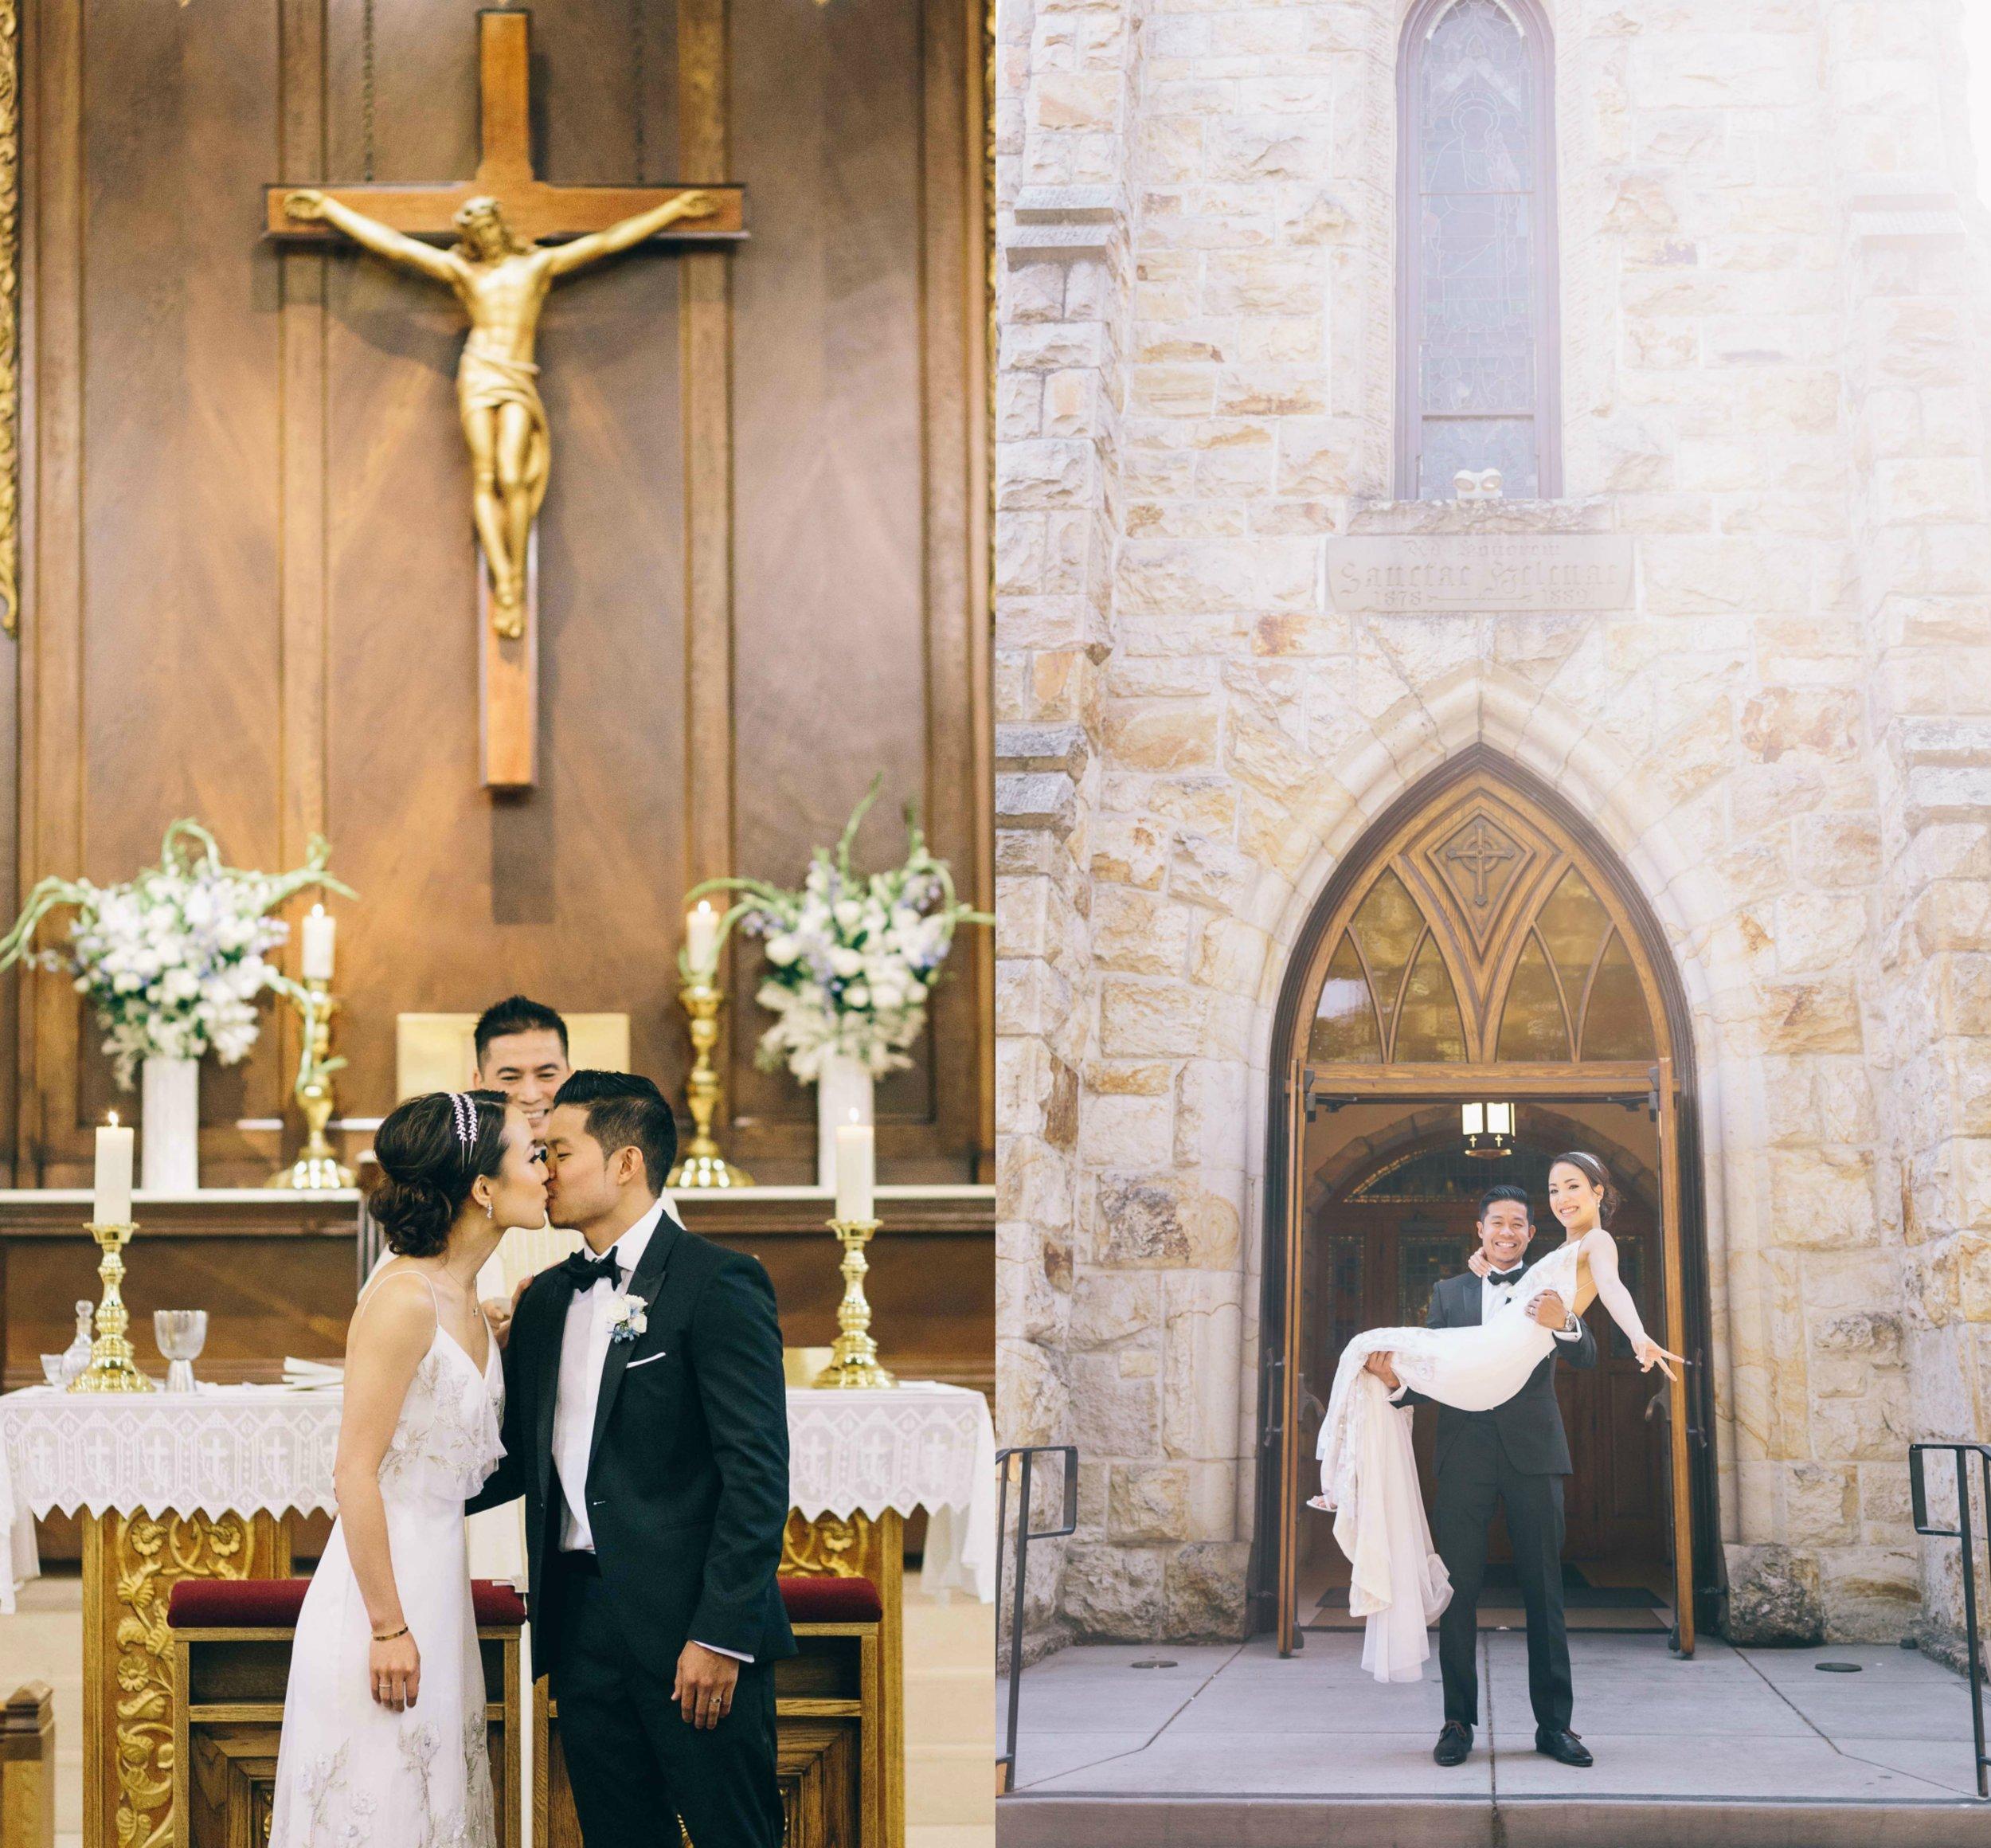 Westin Verasa Wedding at La Toque - JBJ Pictures Wedding Photographer in Napa Sonoma and San Francisco - 1 (4).jpg